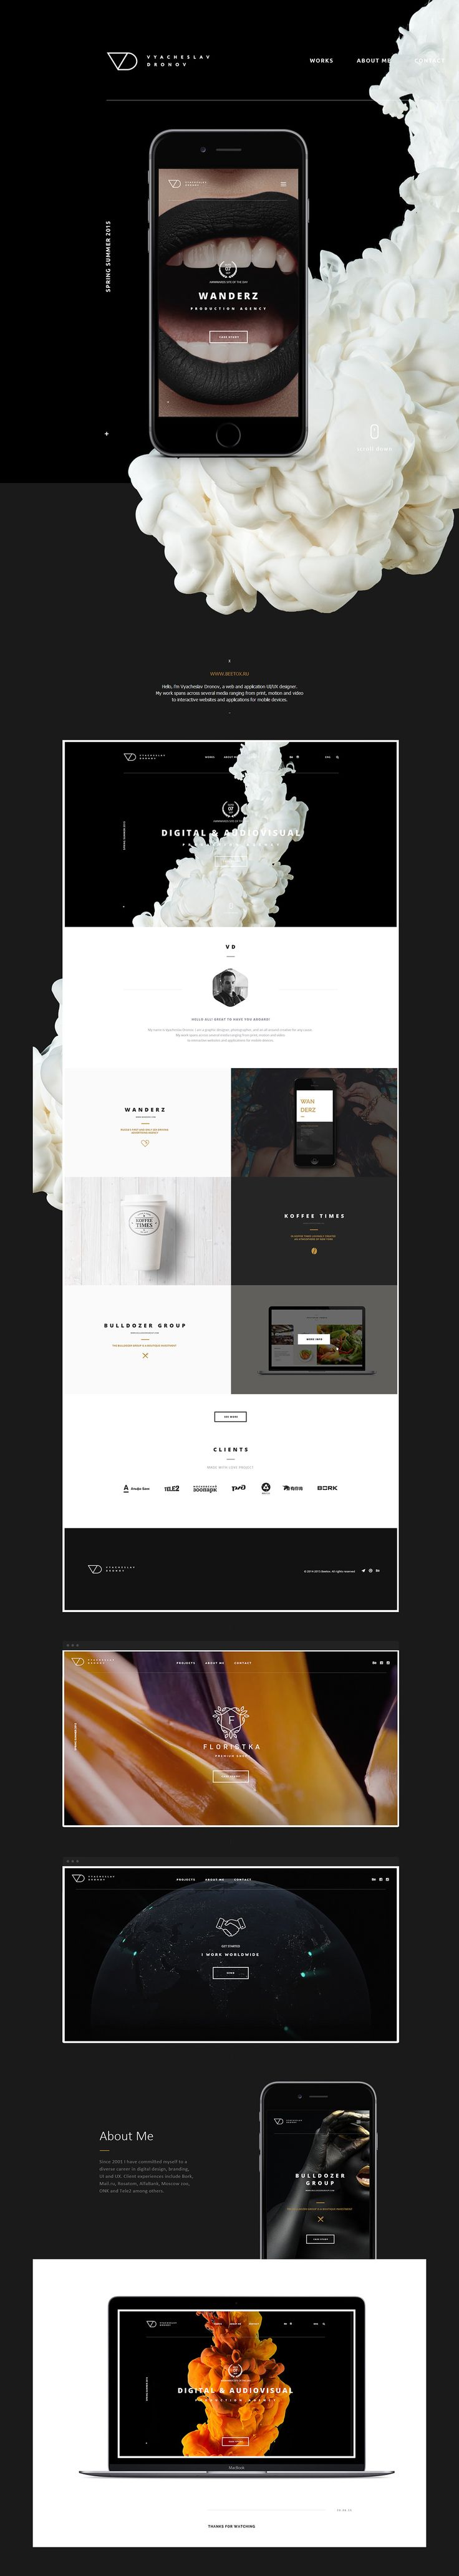 beetox.ru by 国外WEB灵感 - UE设计平台-网页设计,设计交流,界面设计,酷站欣赏